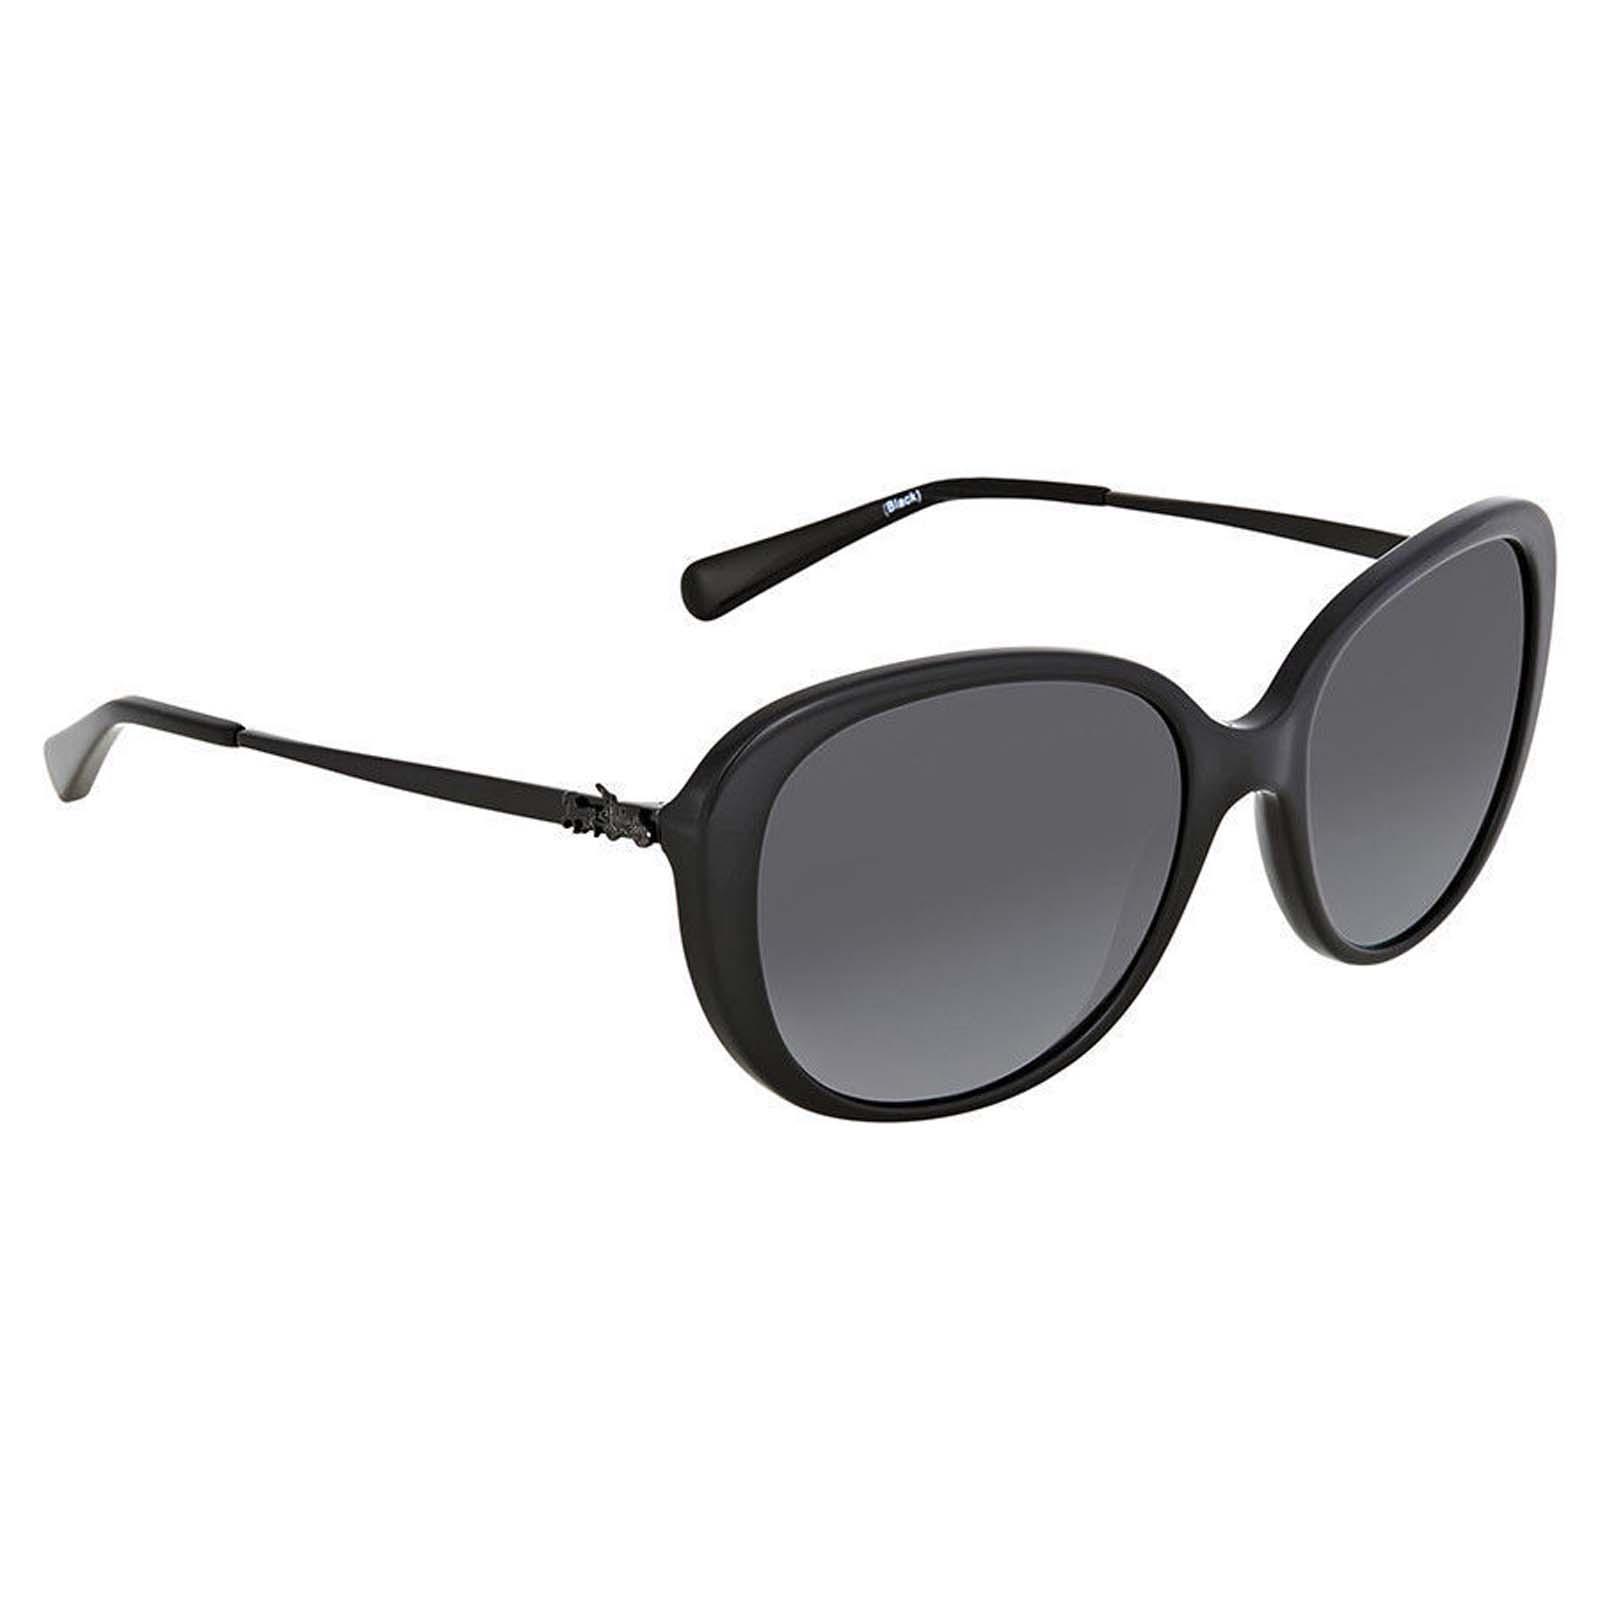 d7f9bcaa5e Coach HC 8215 5482T3 L1651 Black Plastic Sunglasses Grey Gradient Polarized  Lens ...